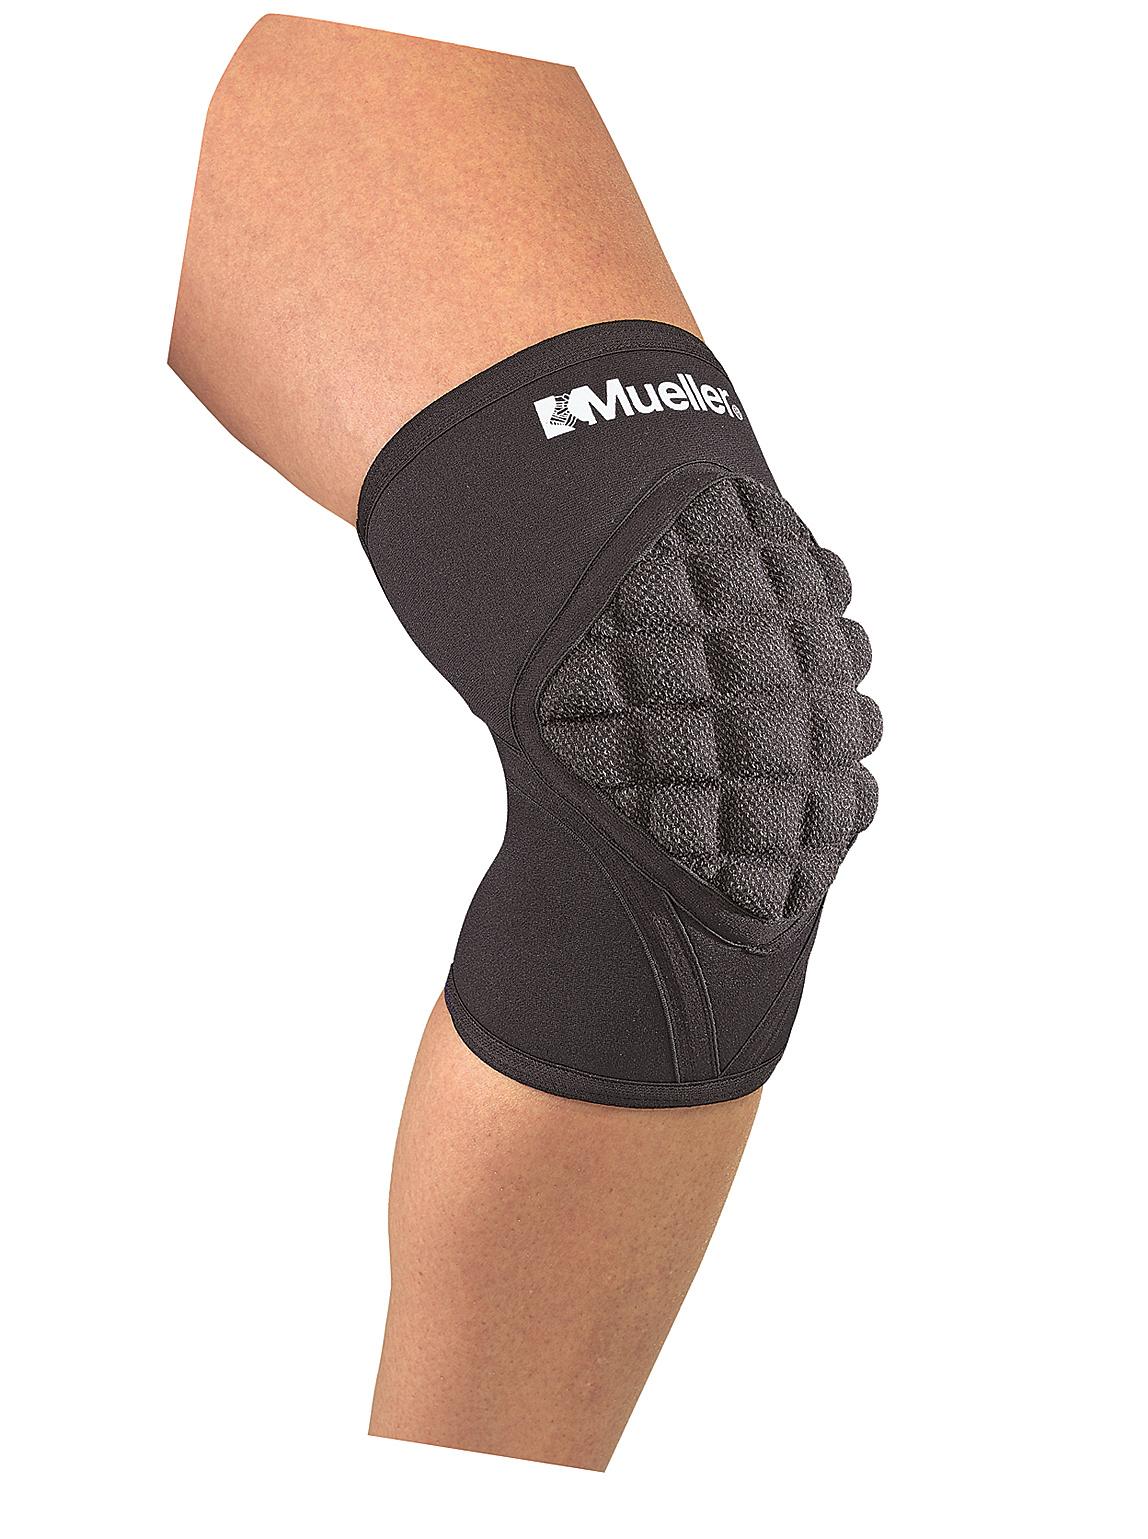 pro-level-knee-pad-w-kevlar-xl-54534-74676545349-lr.jpg